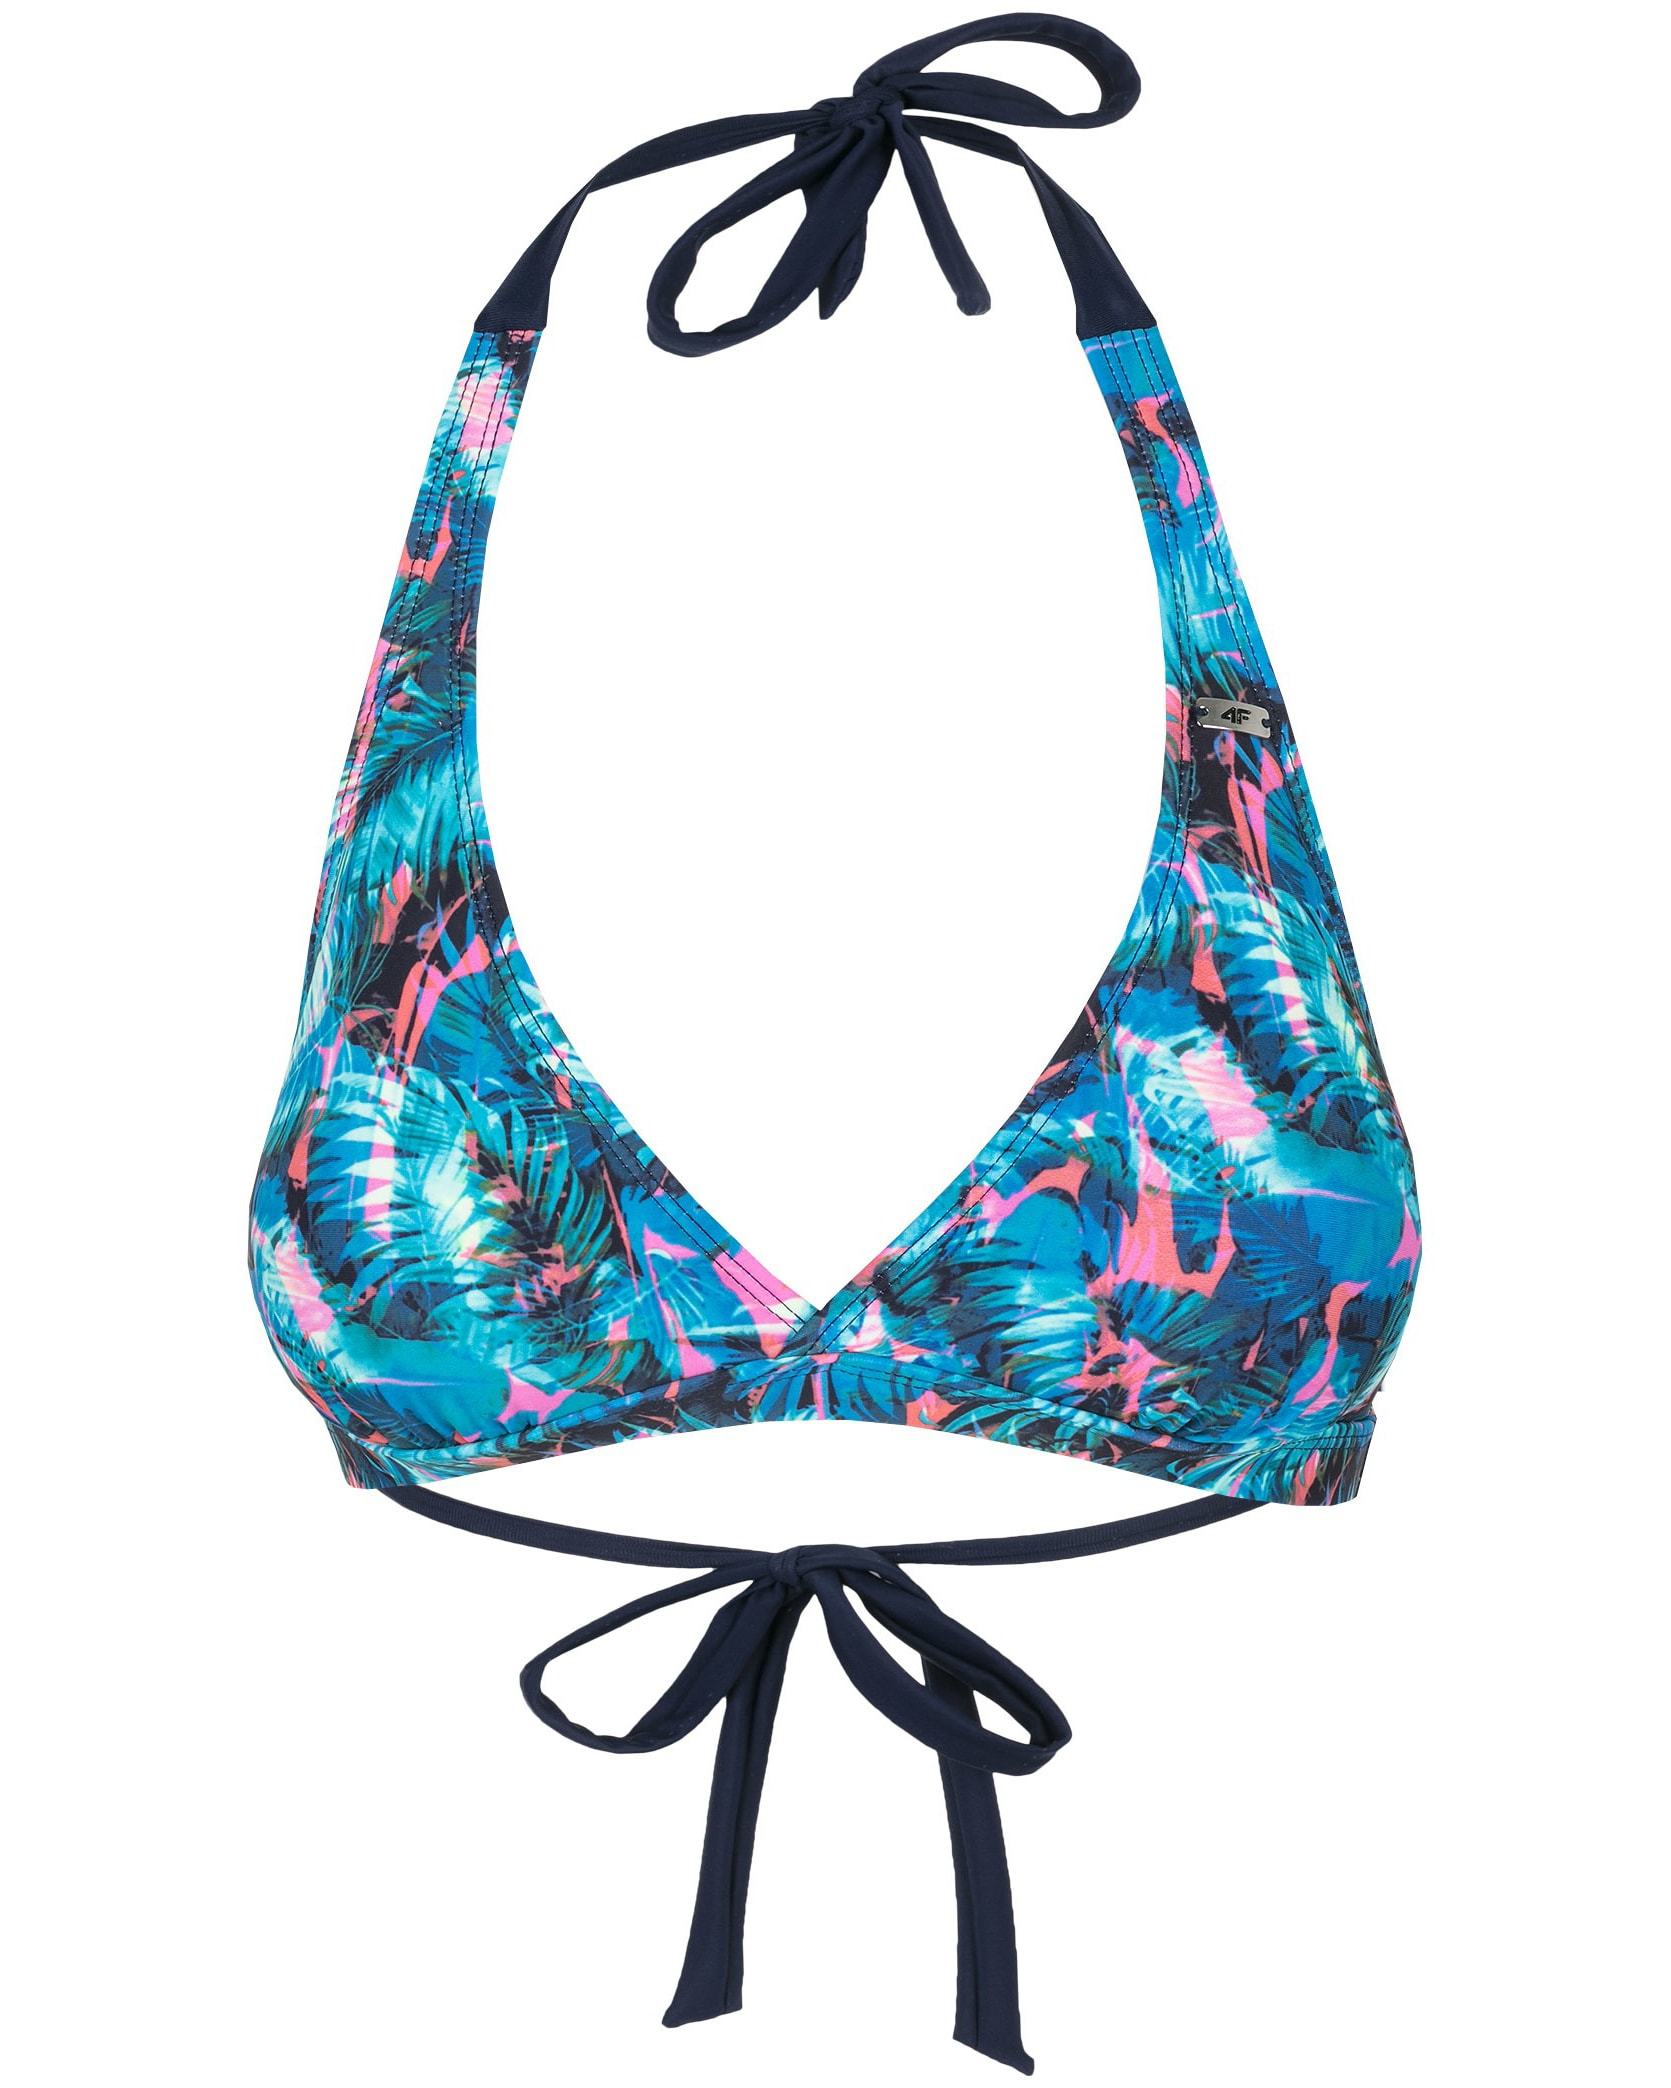 4F Women's Swimsuit - Multi Colour